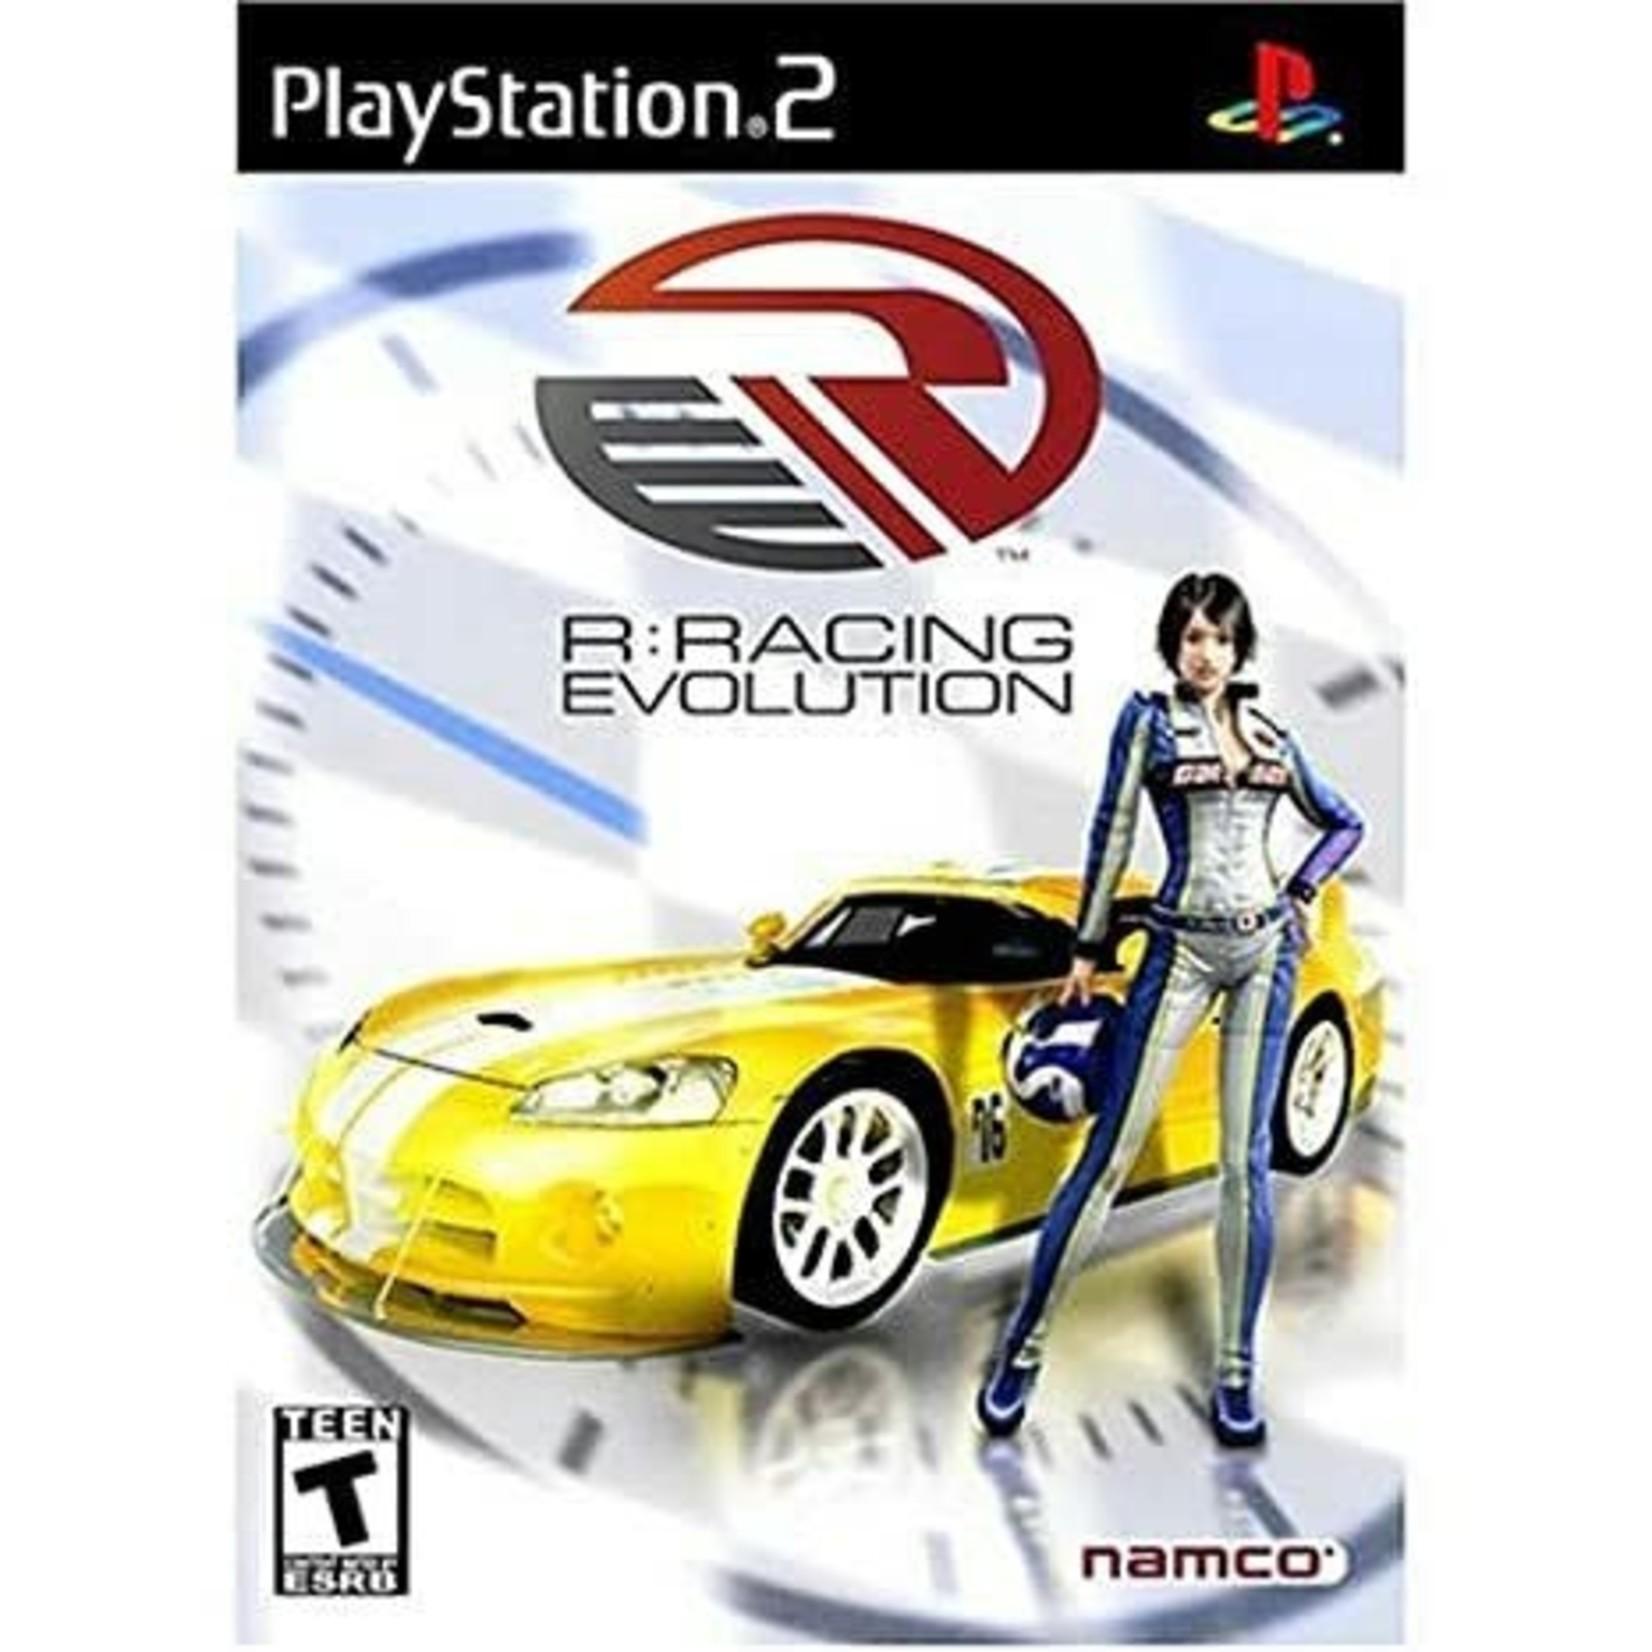 PS2U-R: Racing Evolution